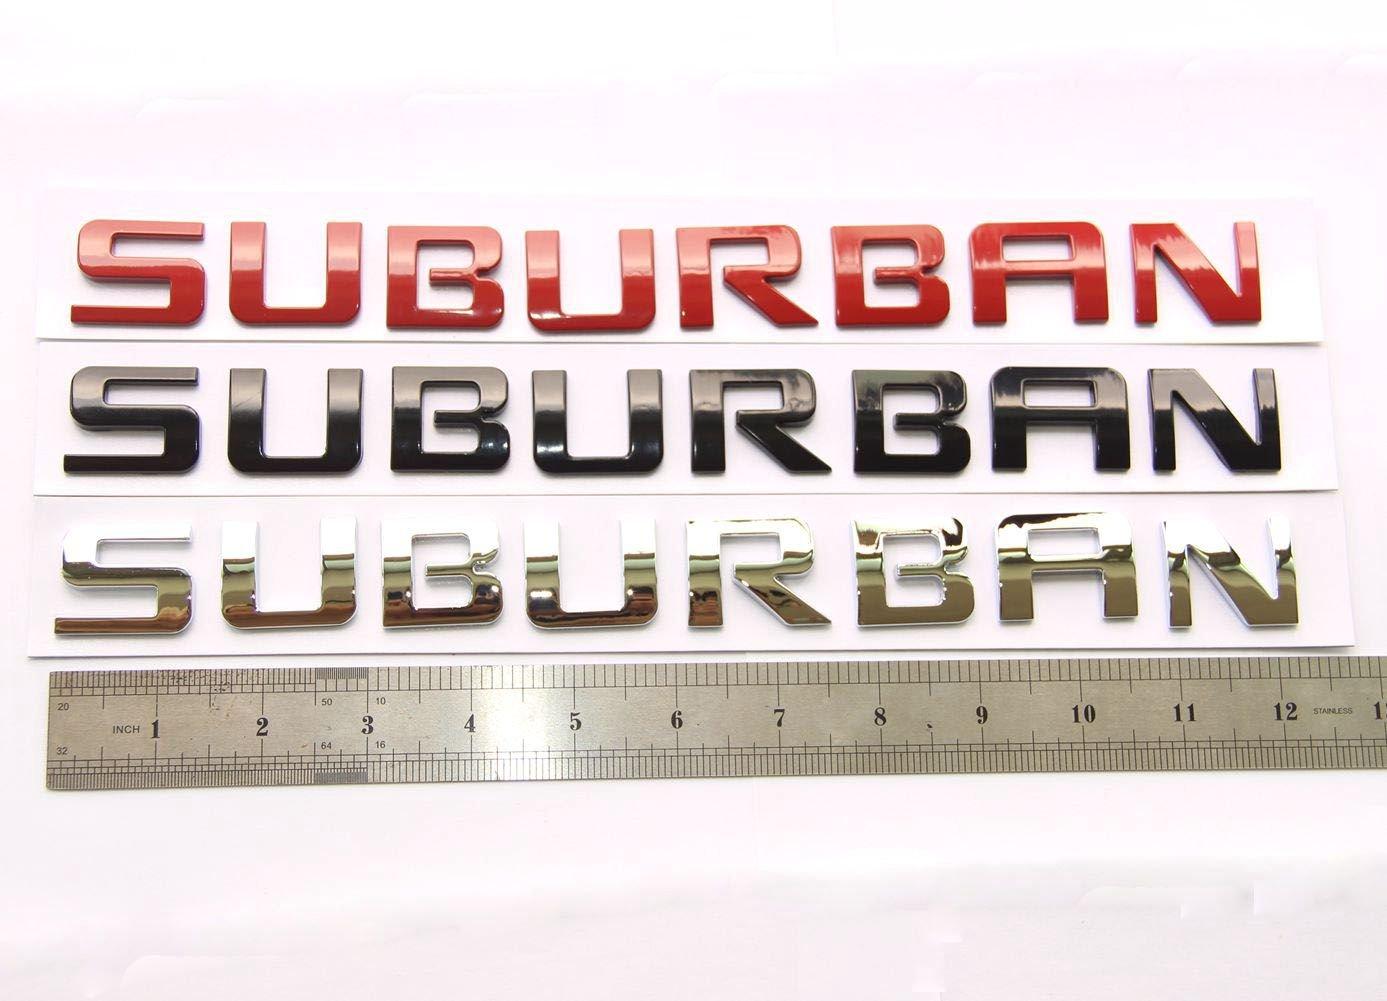 Yoaoo/® 1x OEM Chrome SUBURBAN Nameplate Emblem Alloy Letter Badge for Gm 07-16 SUBURBAN Chevrolet Glossy Shiny